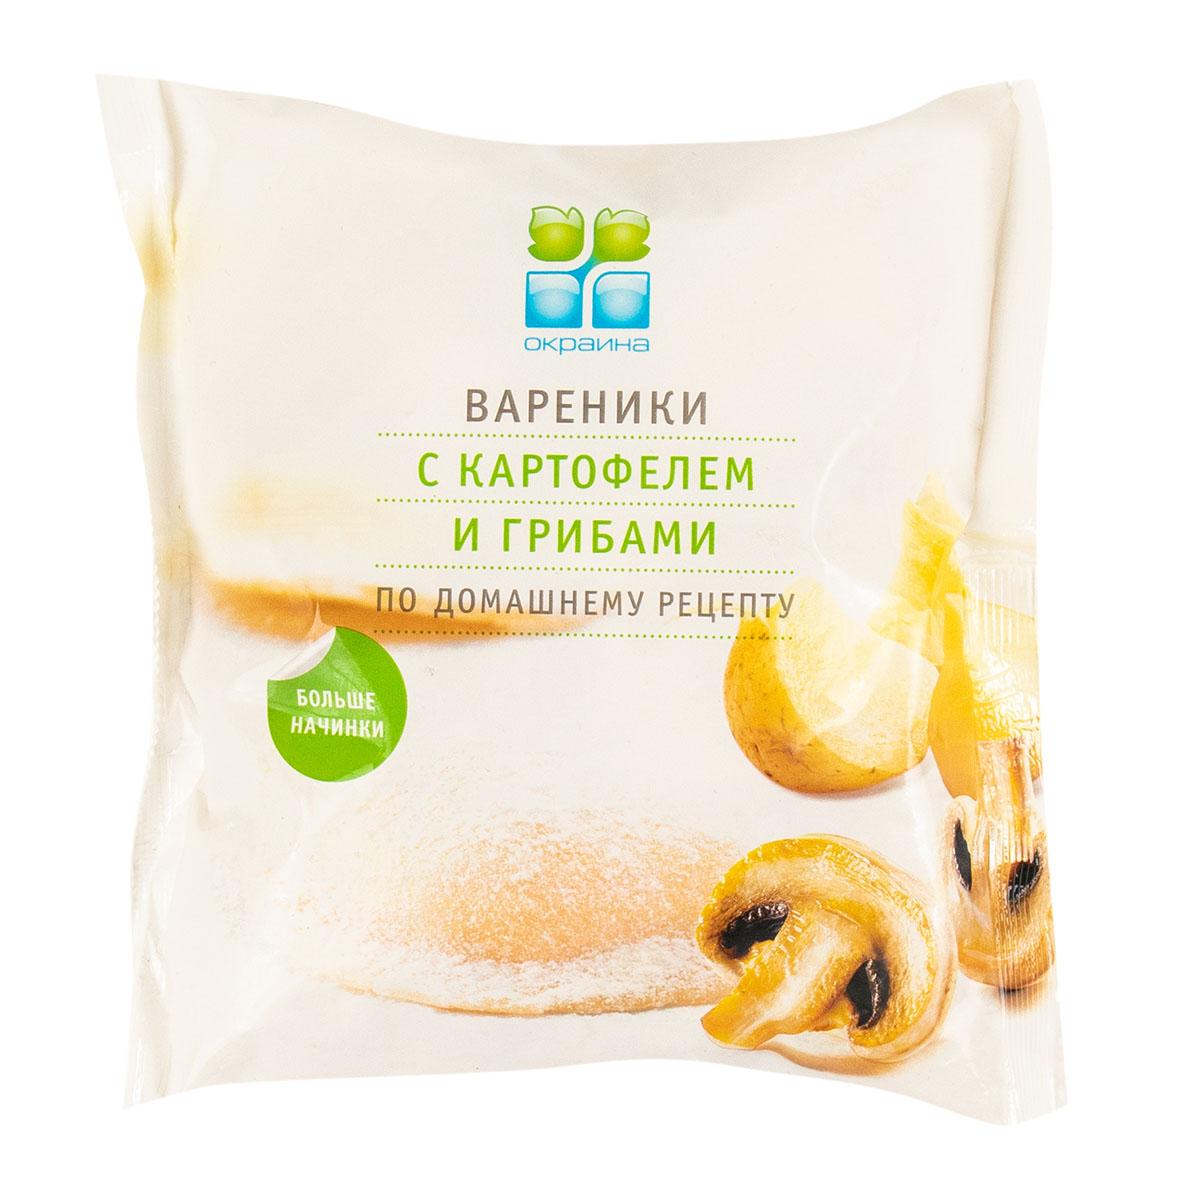 «Окраина» с картофелем и грибами